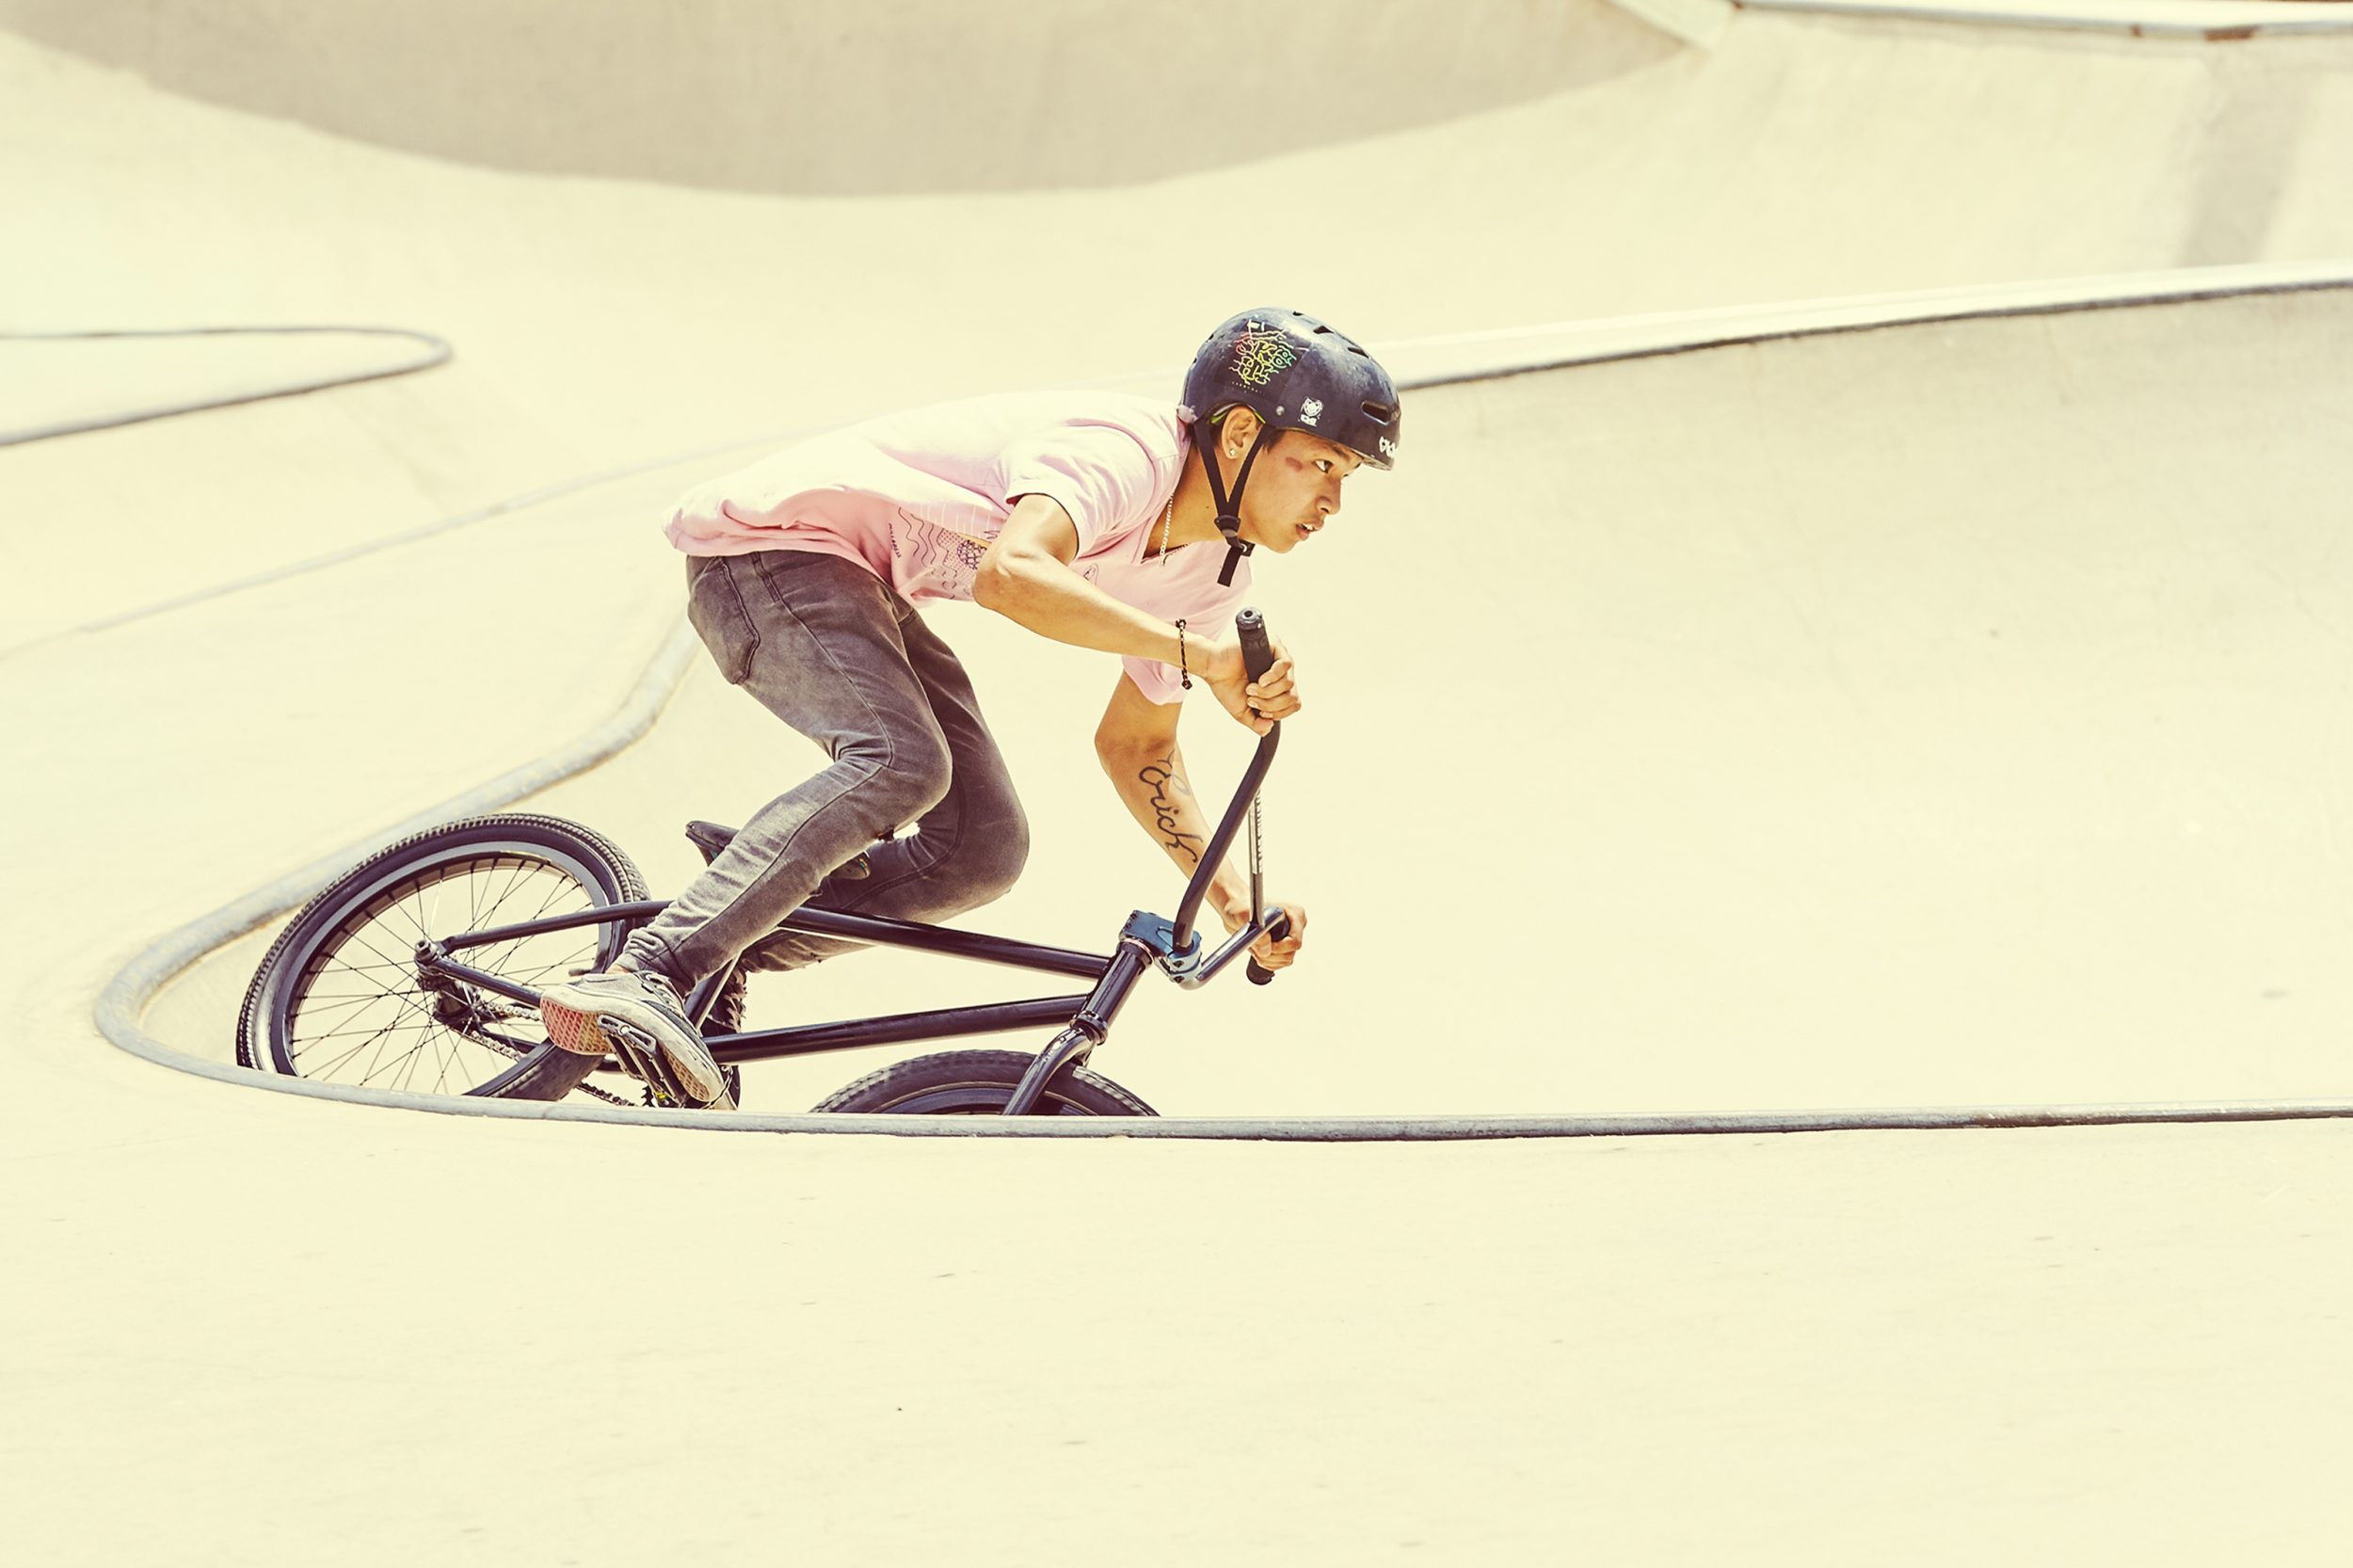 BMX rider in a half pipe